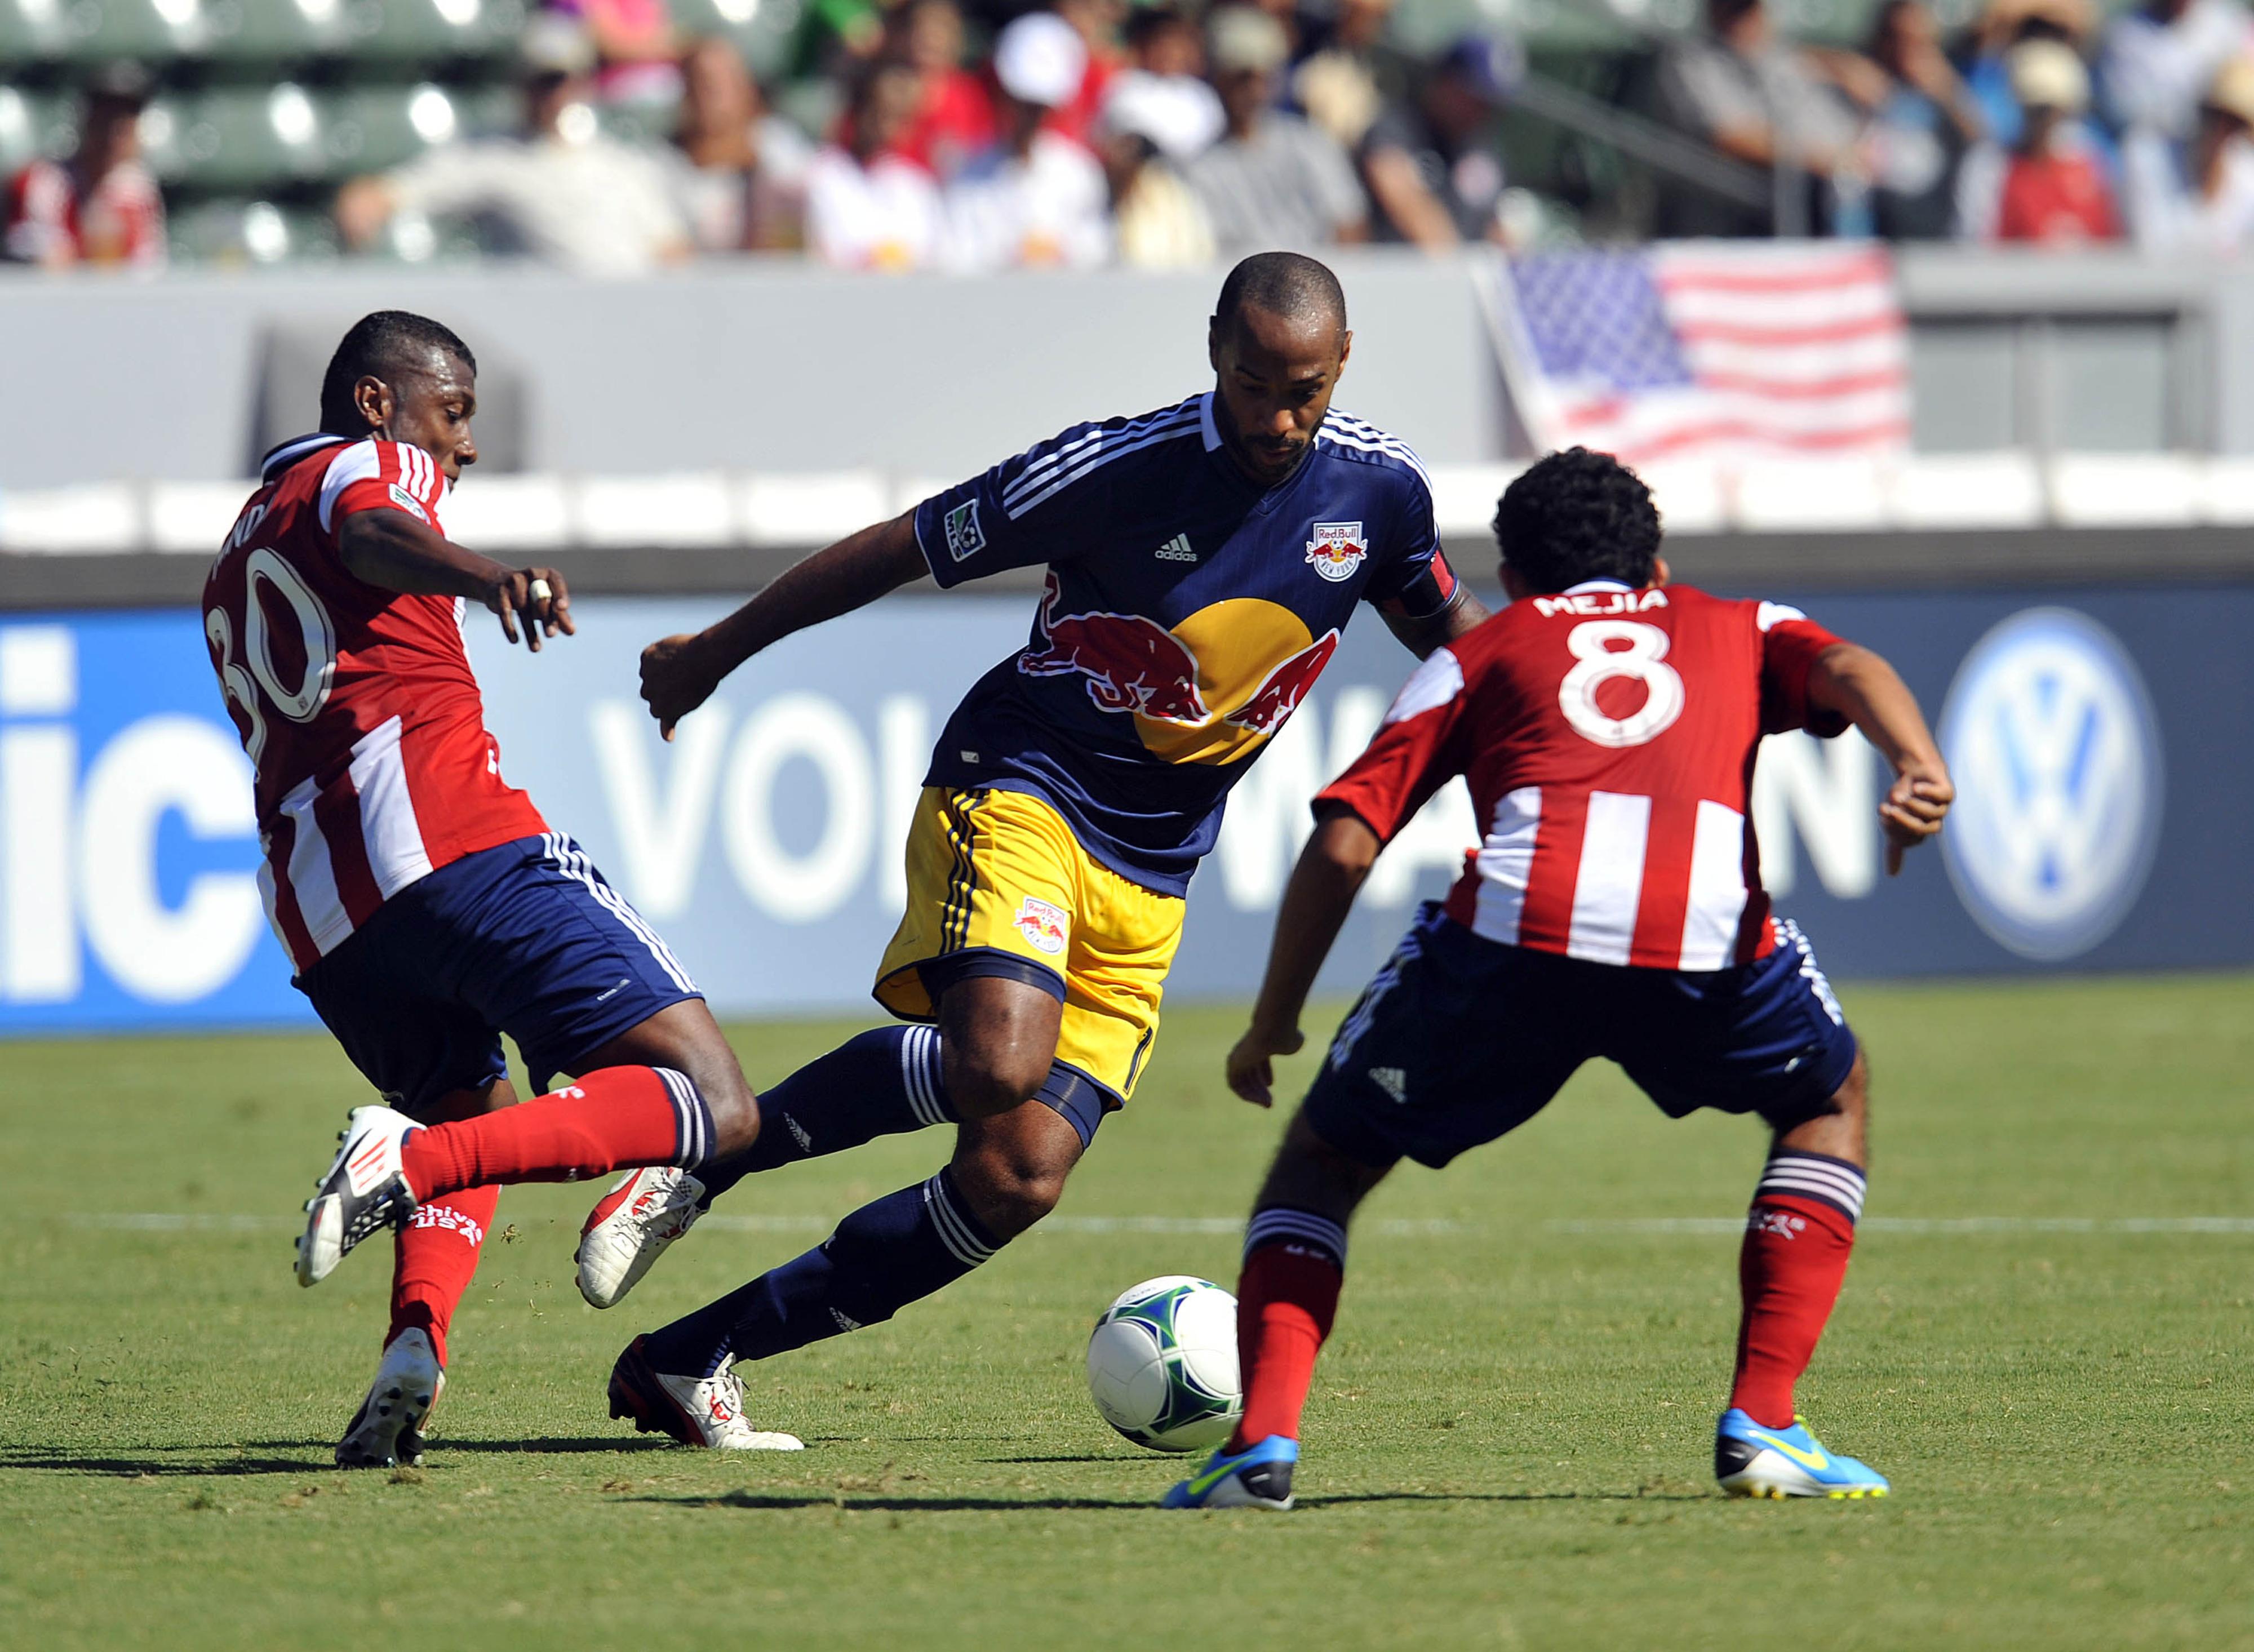 Midfielders Oswaldo Minda and Edgar Mejia disrupt Thierry Henry